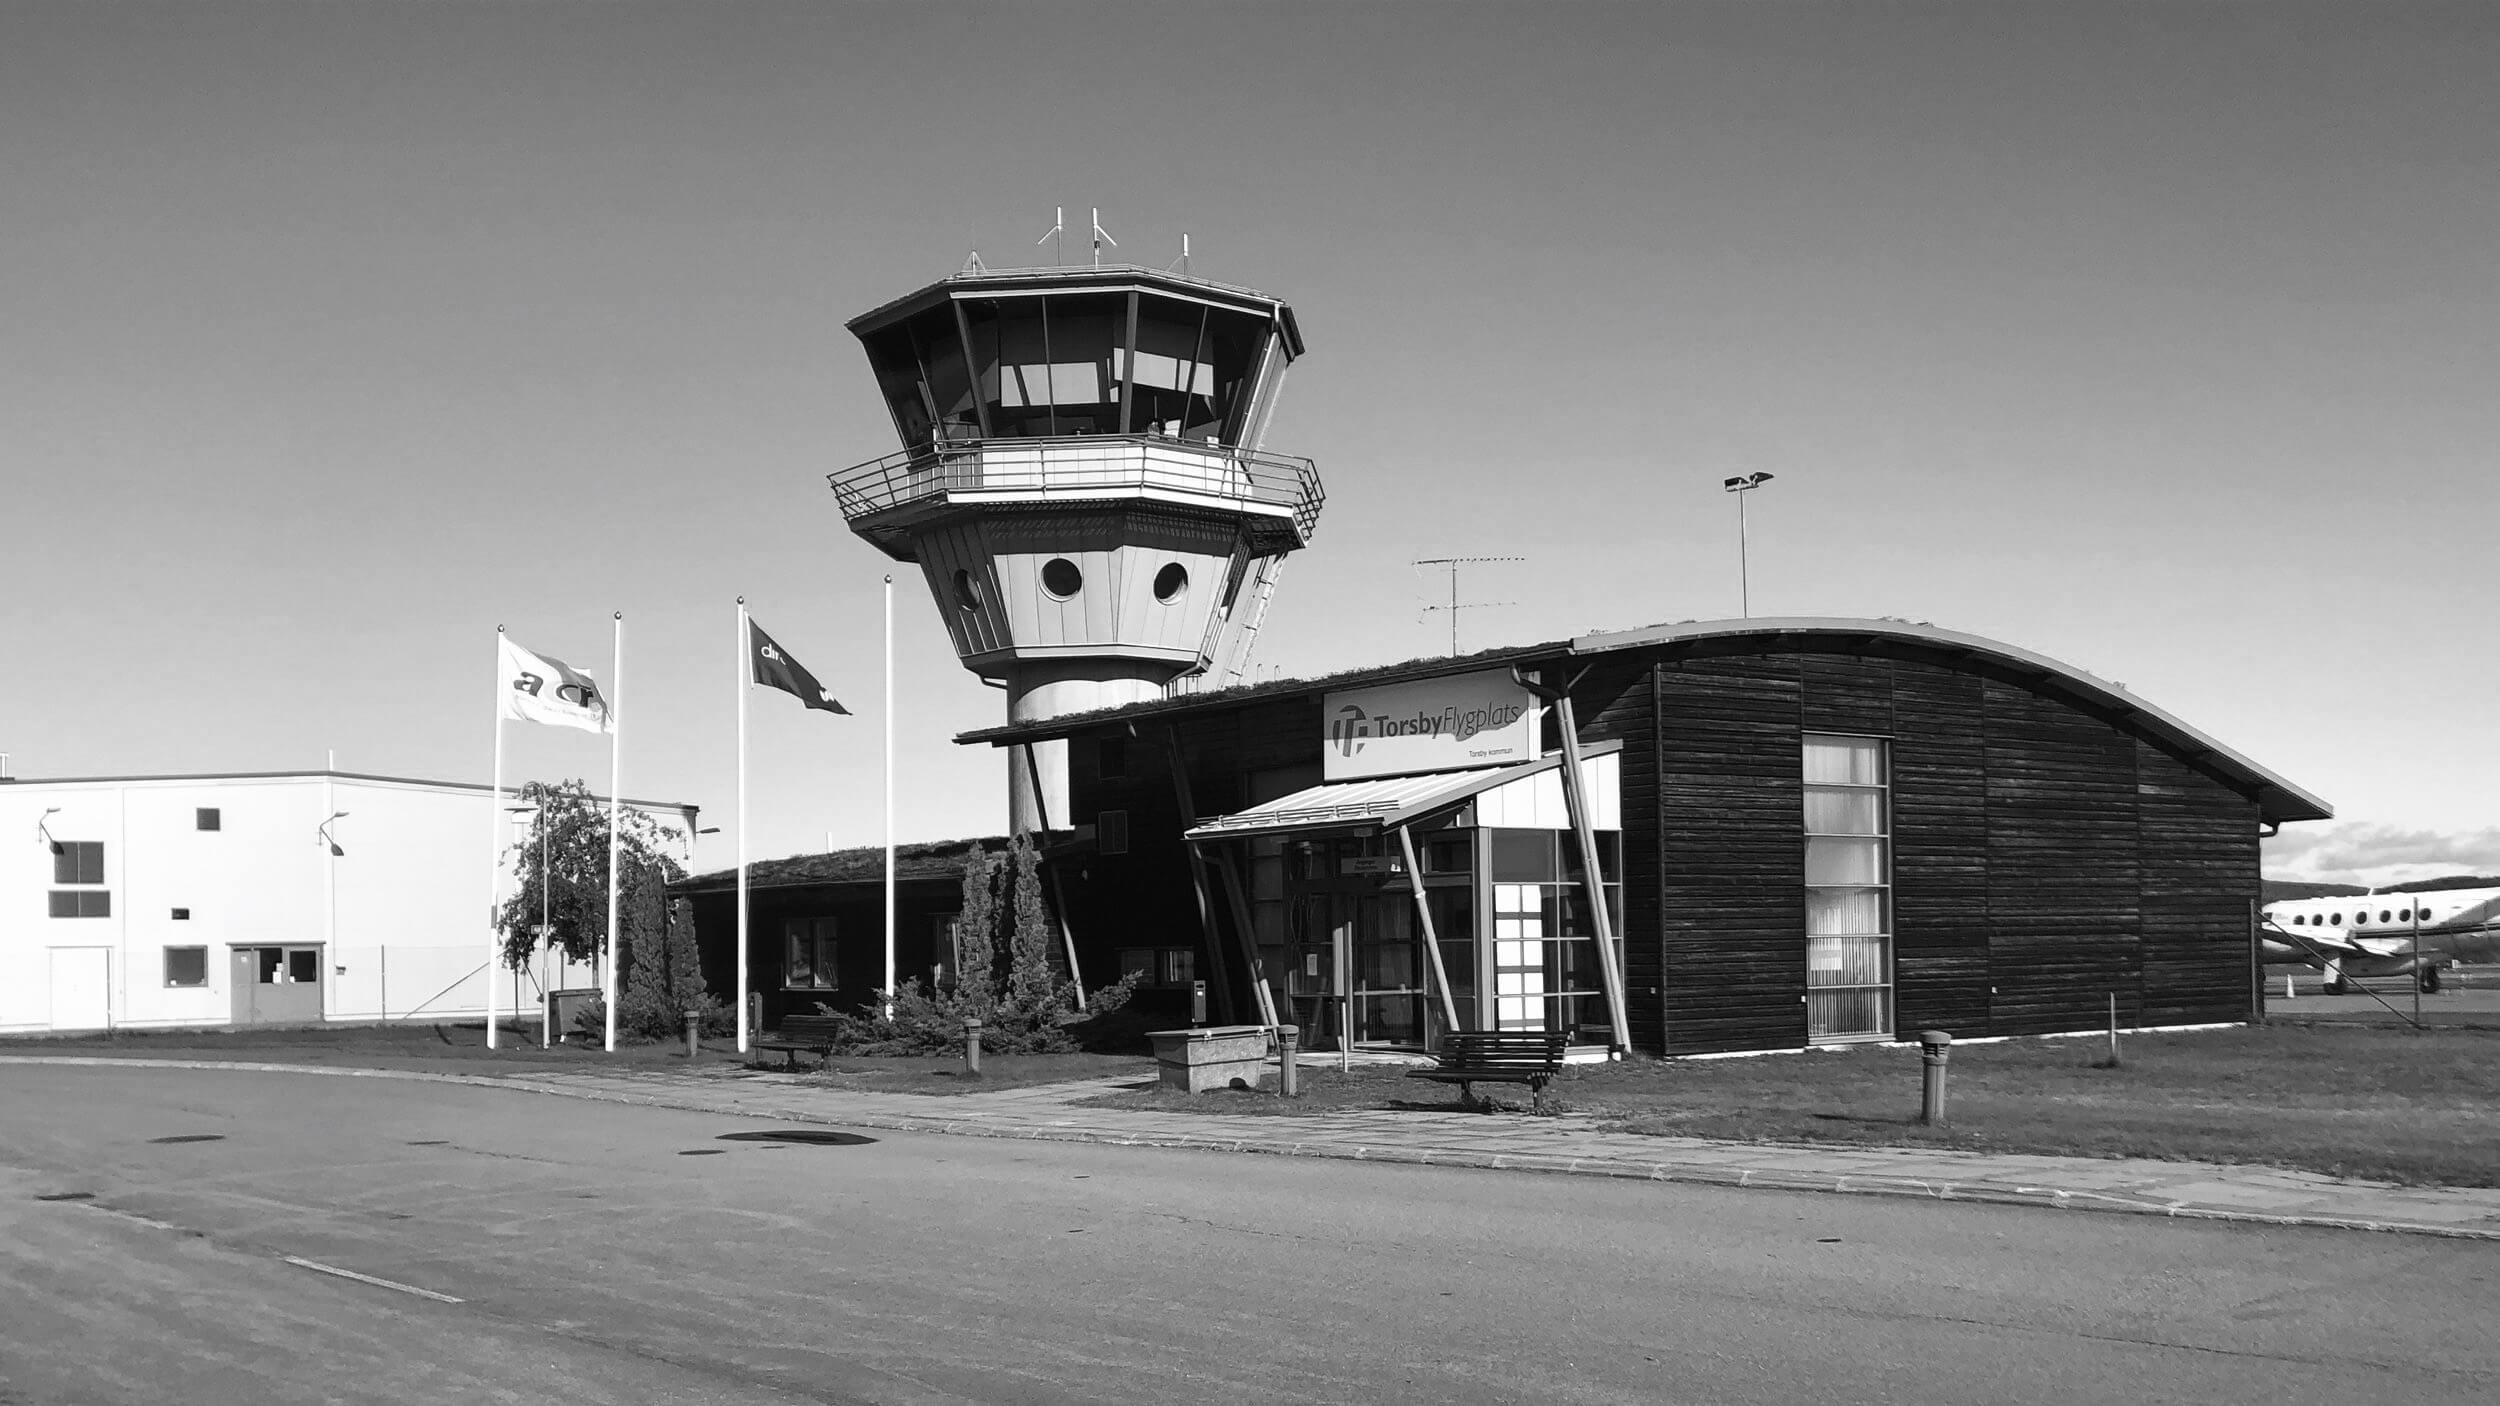 ESST - Torsby Airport